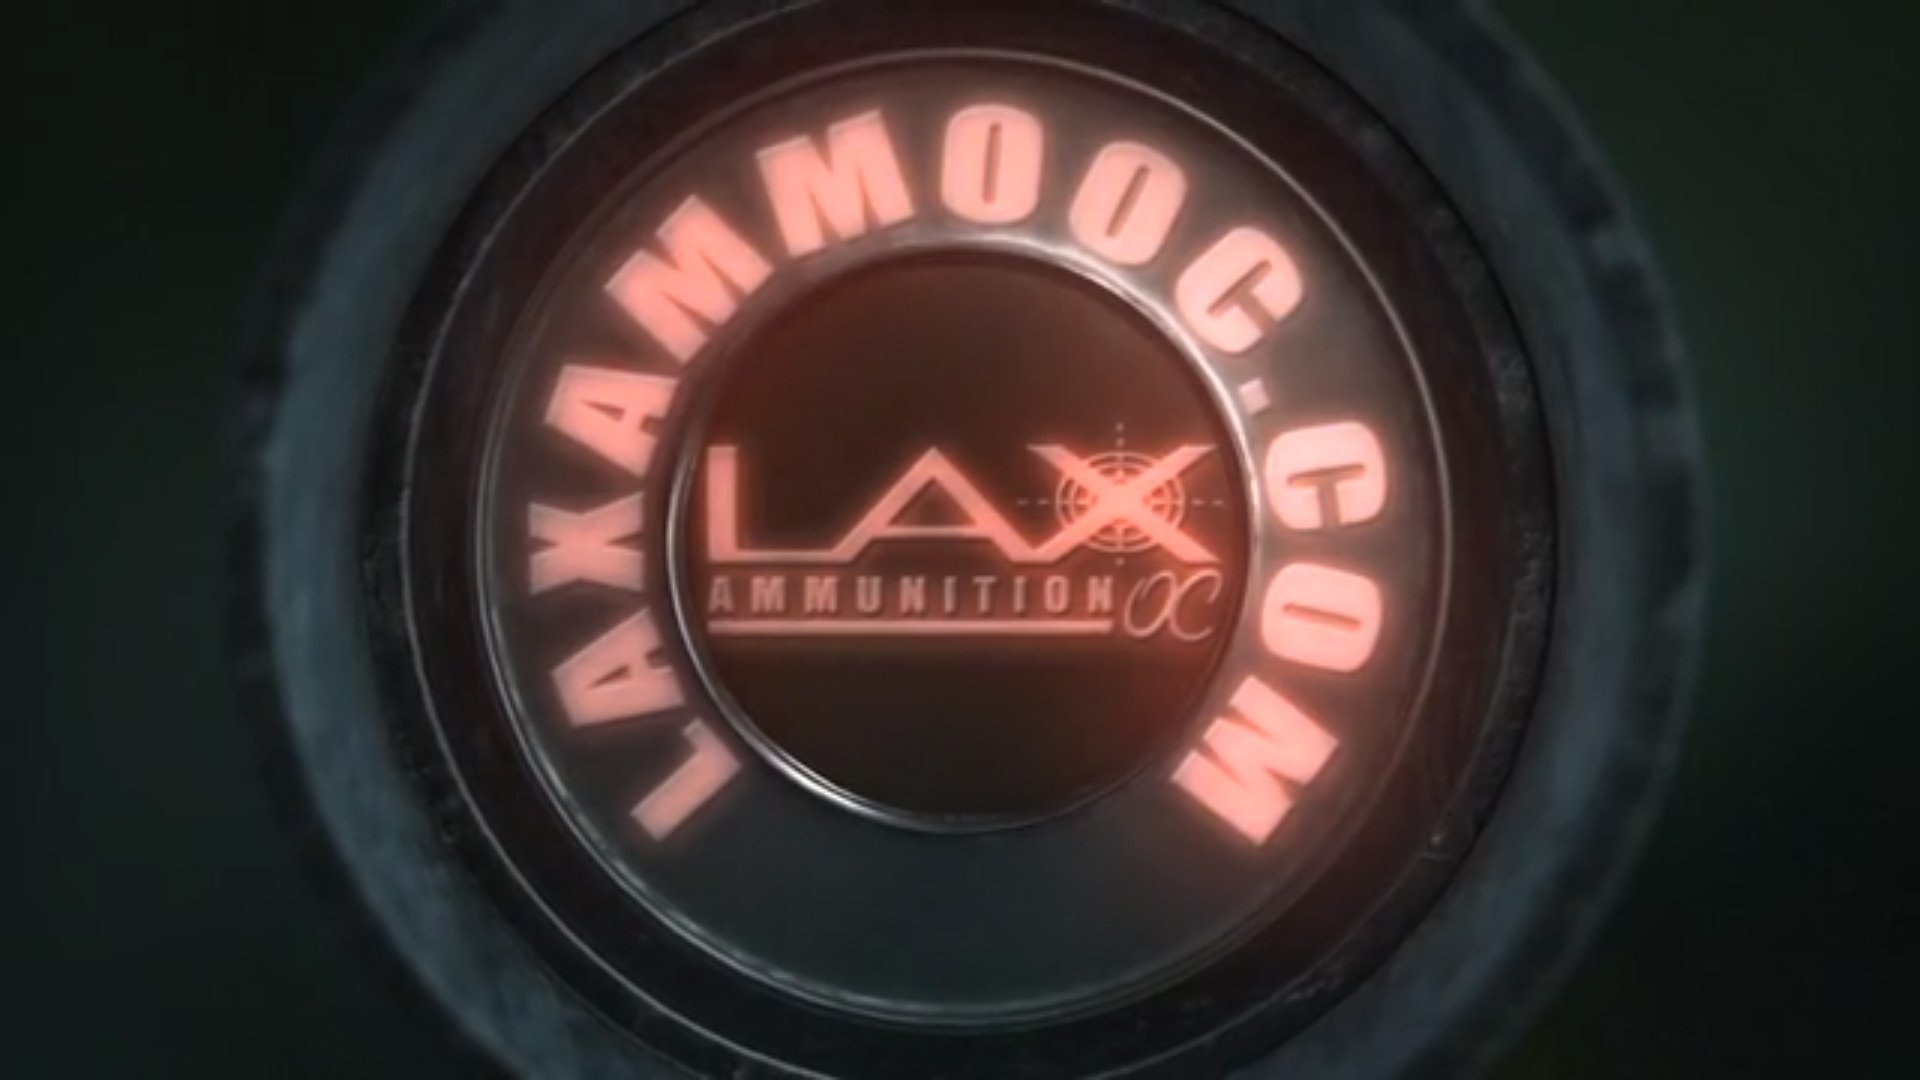 lax-ammo-oc